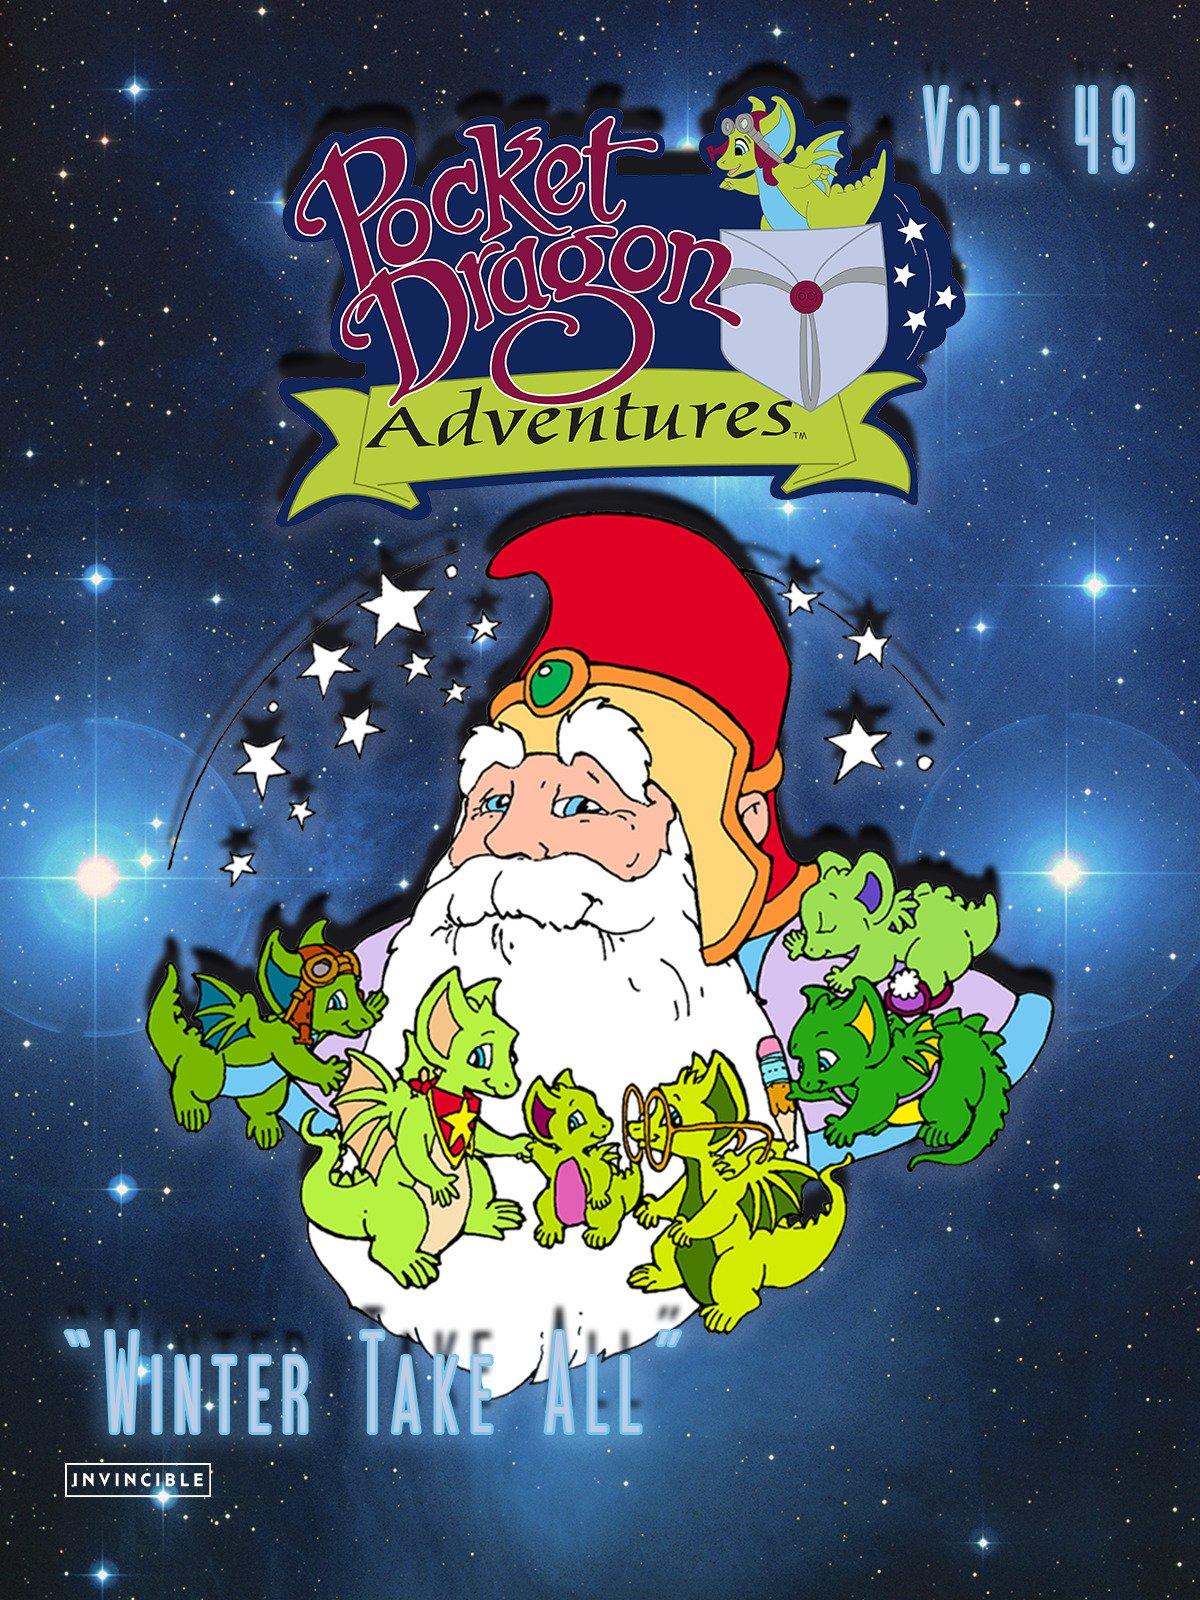 Pocket Dragon Adventures Vol. 49Winter Take All